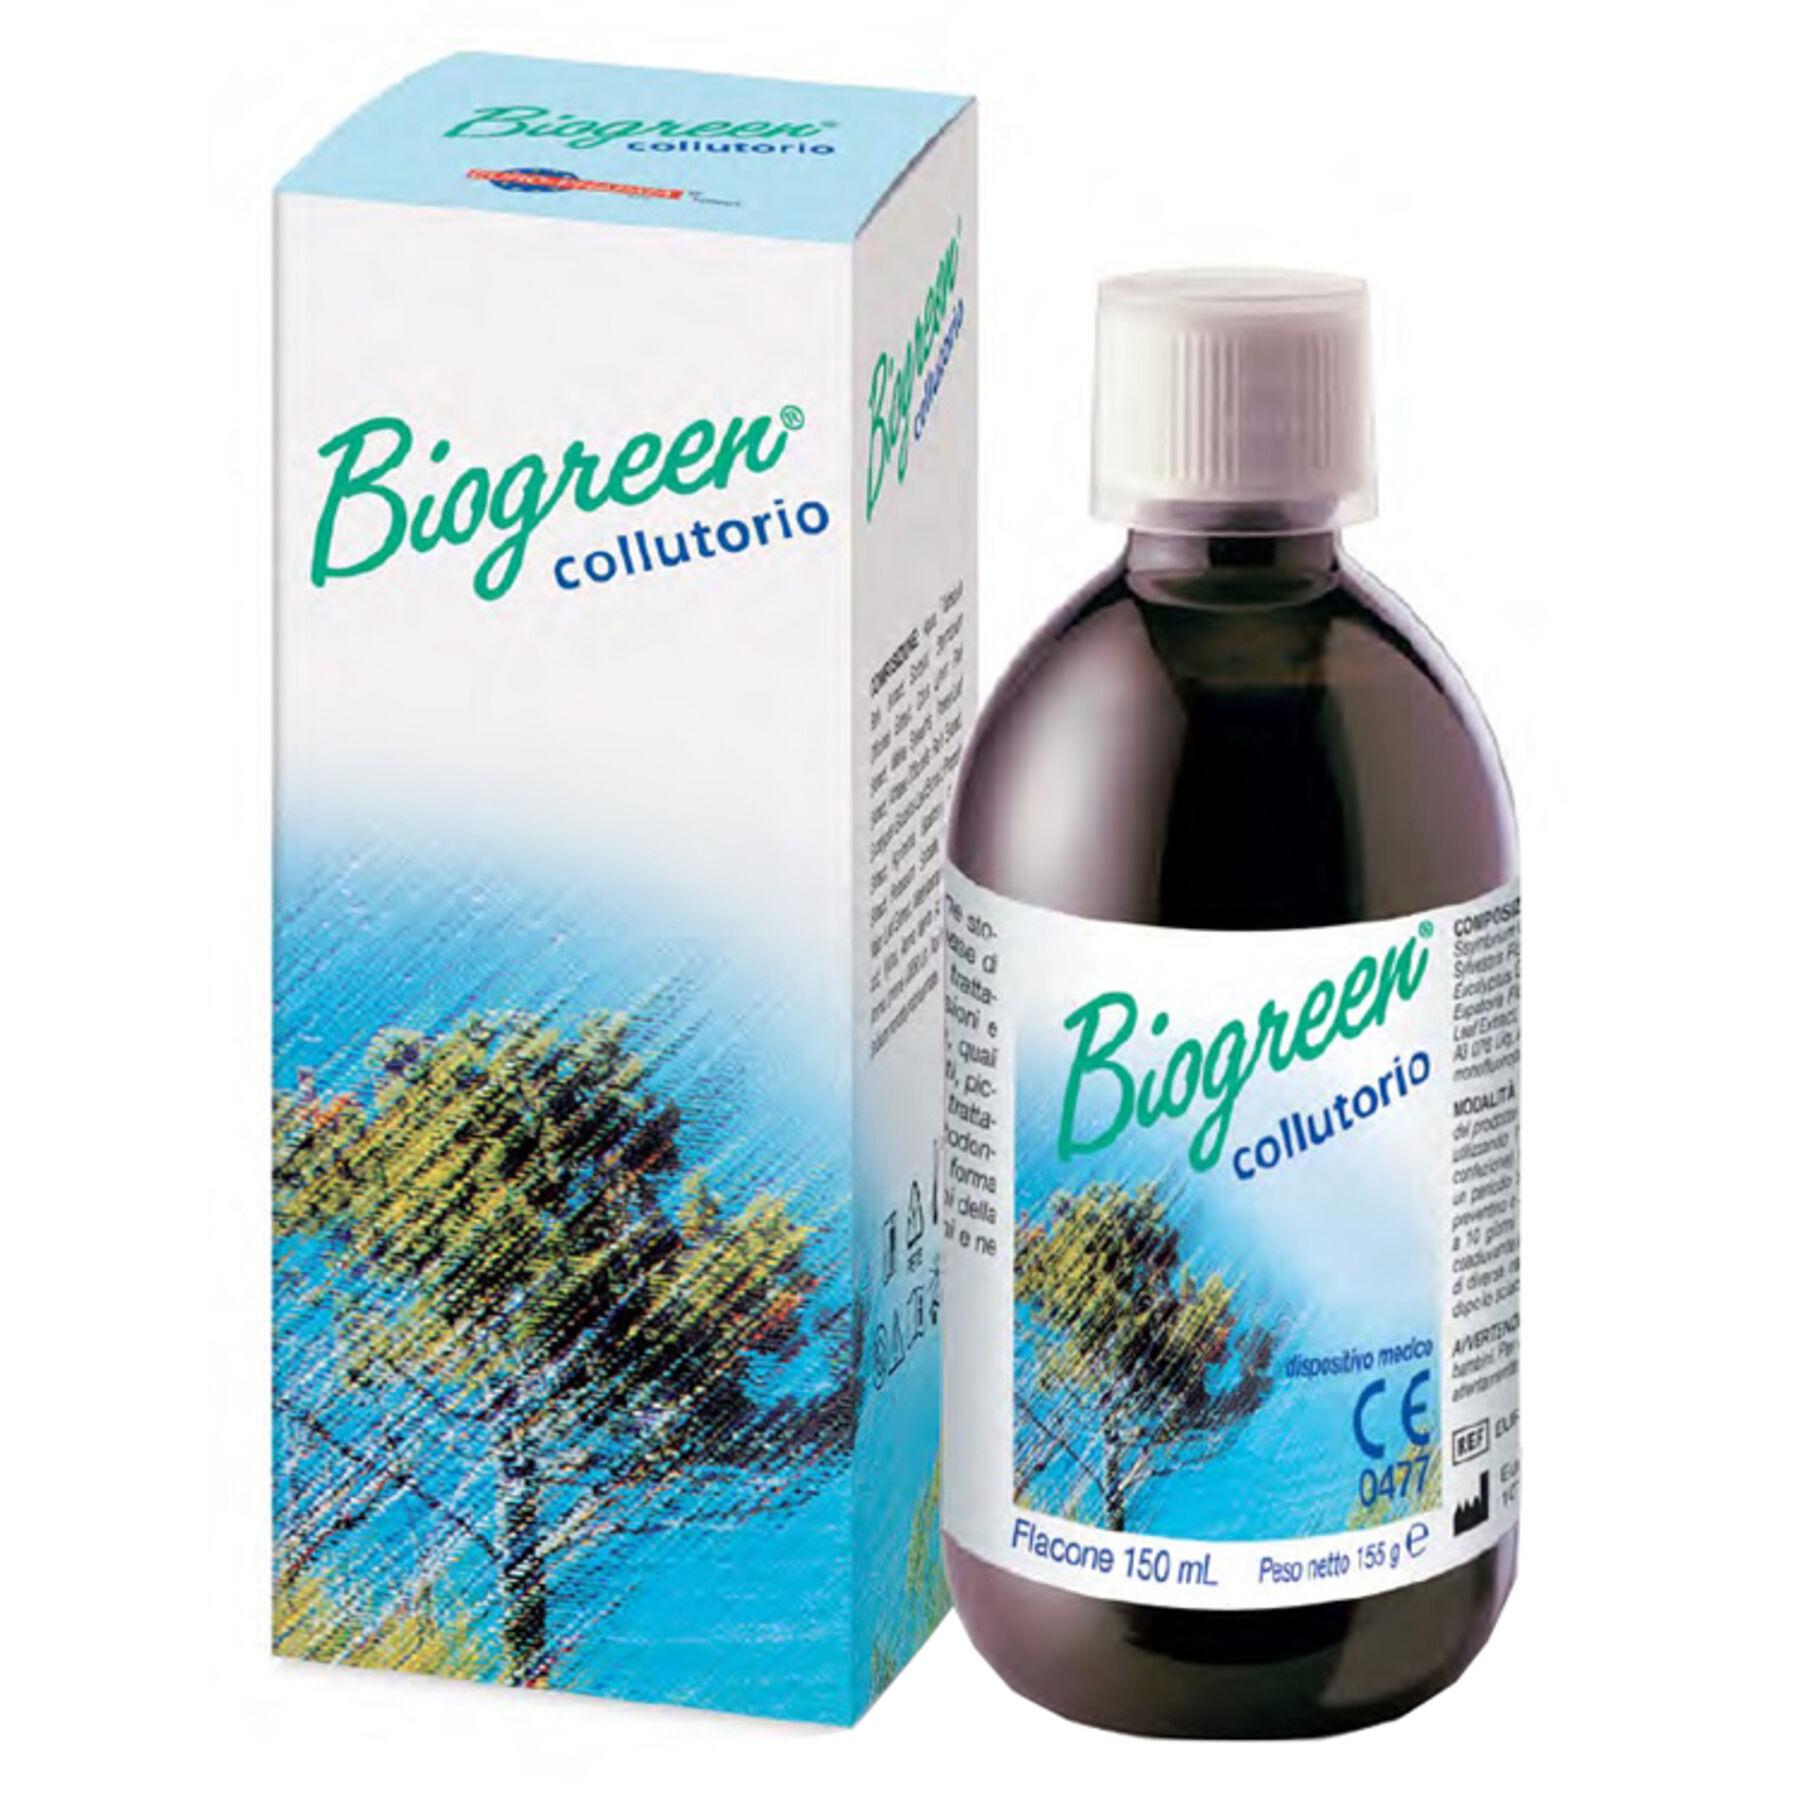 euro-pharma srl collutorio biogreen 150 ml